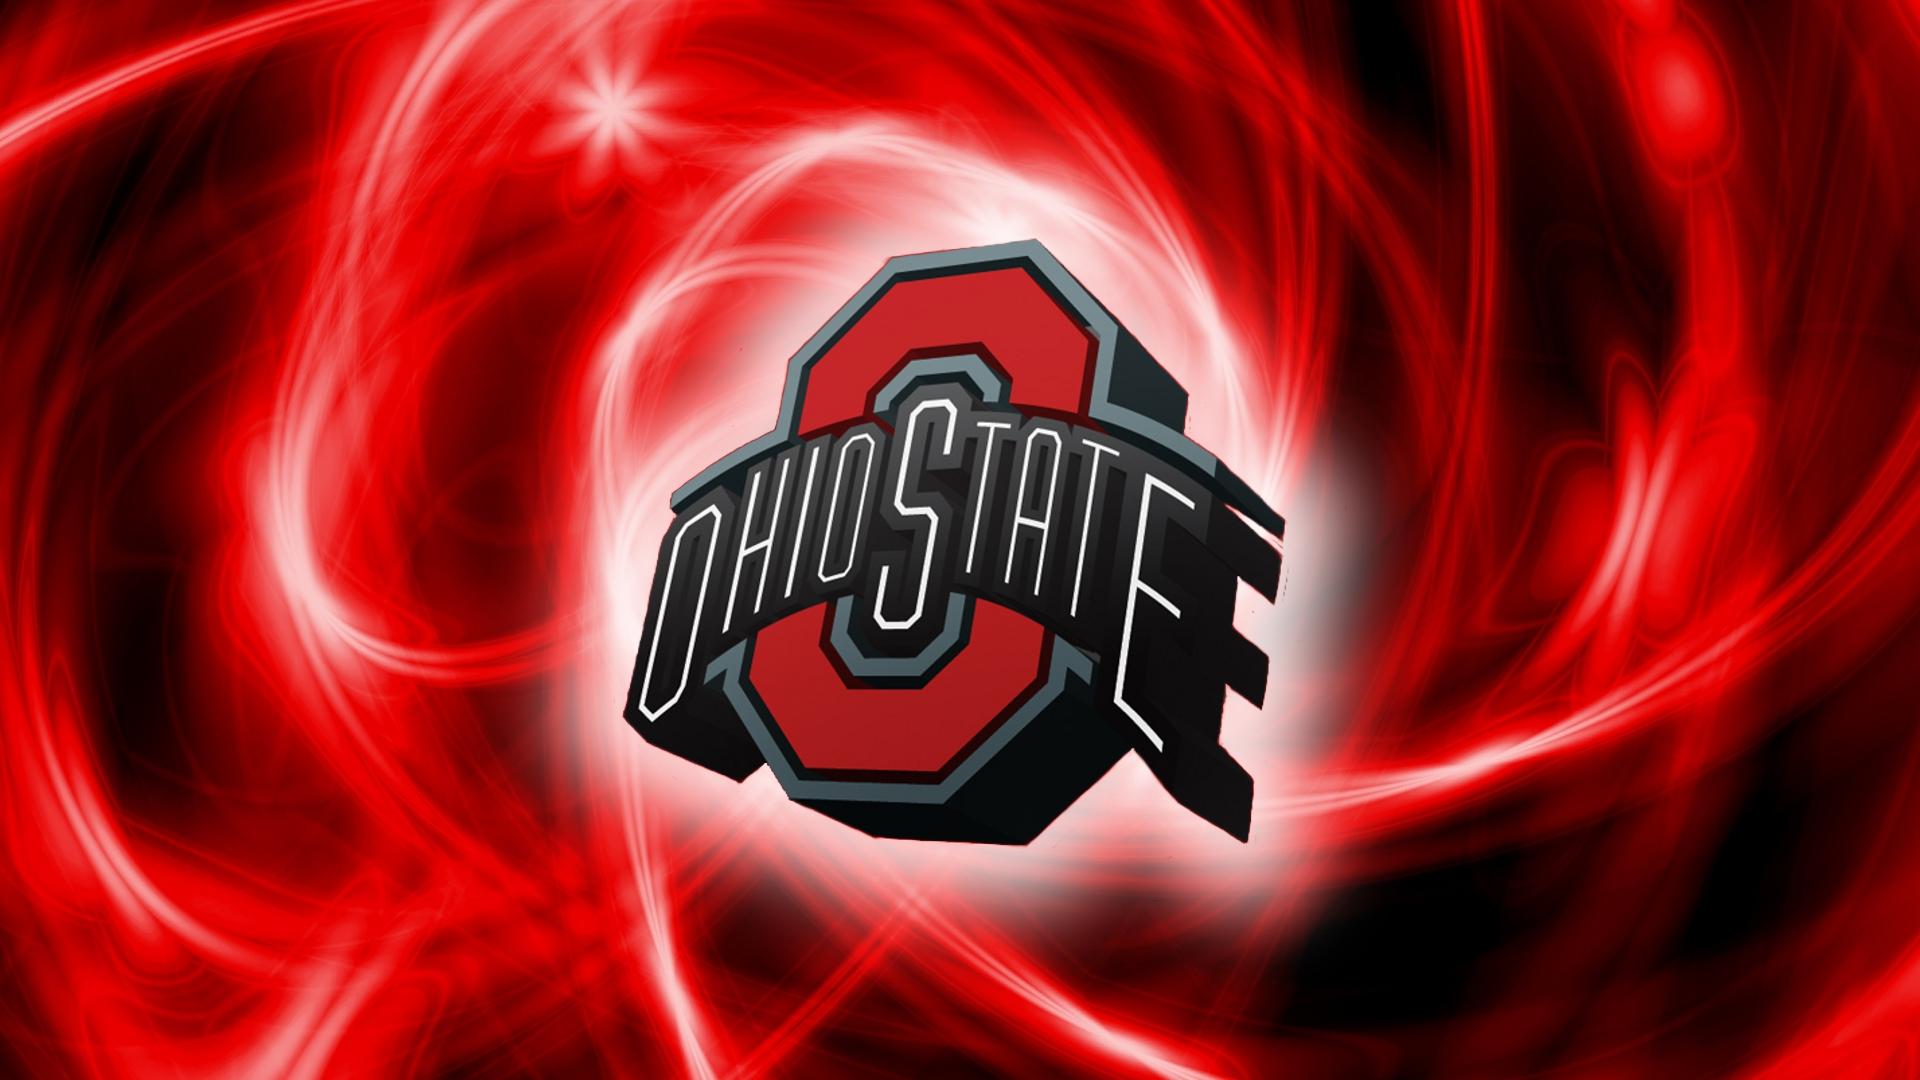 ohio state footballimages29088652titleosu wallpaper 209 wallpaper 1920x1080